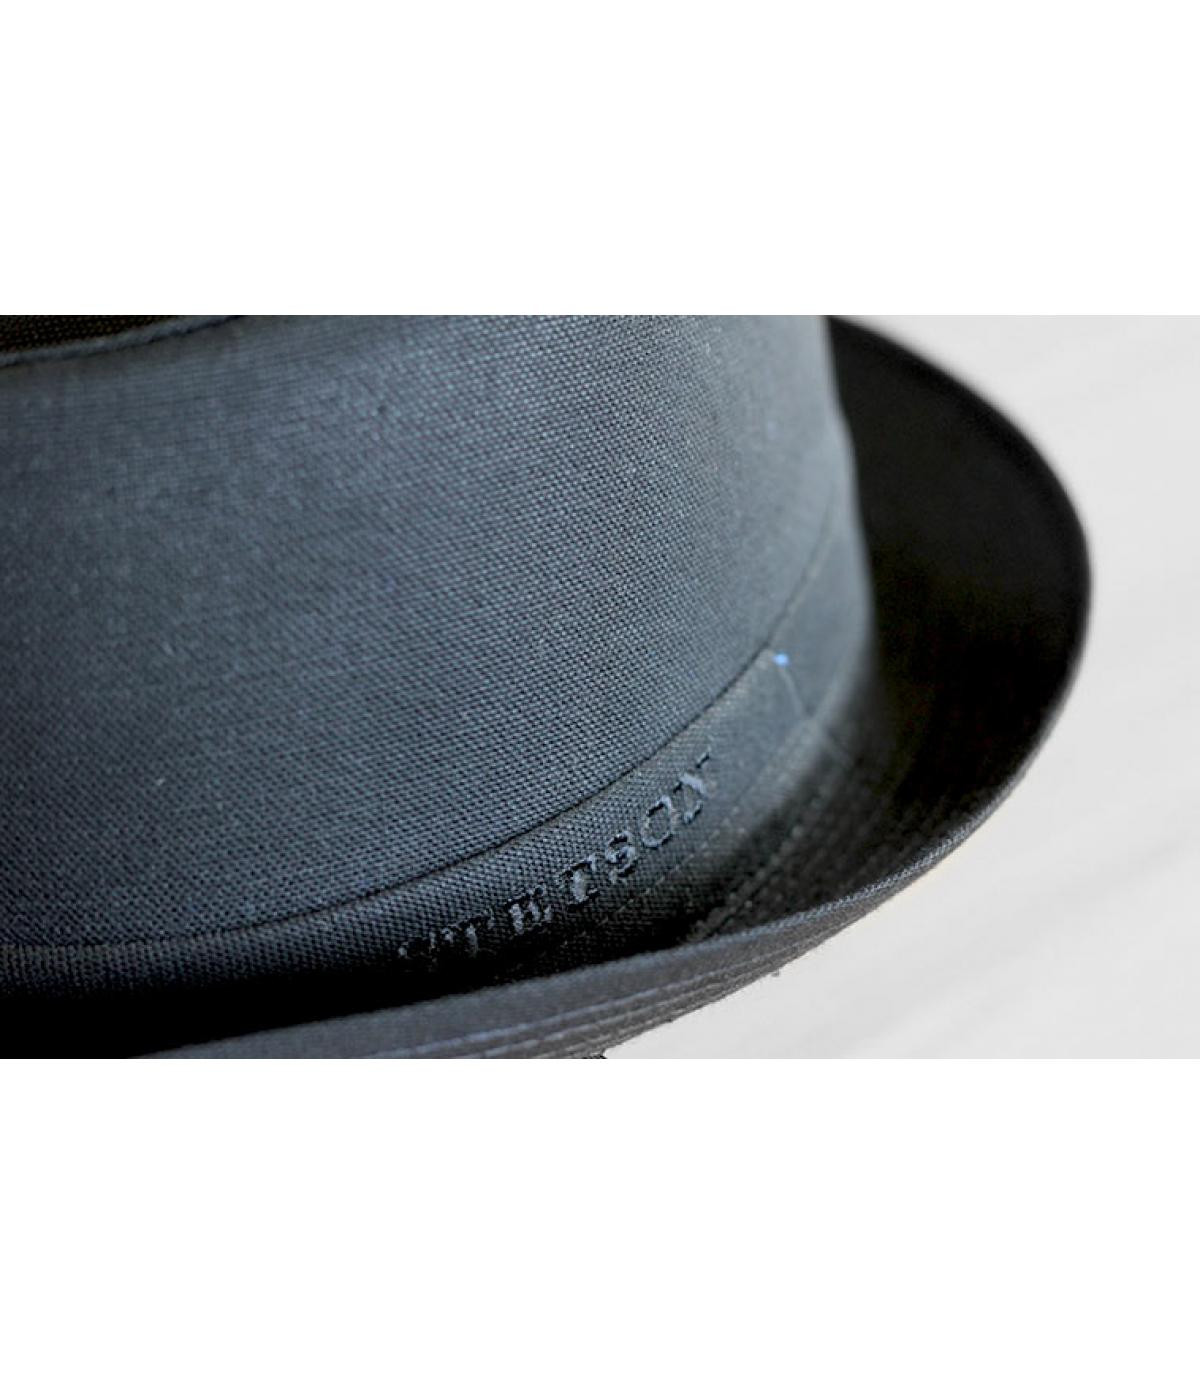 Chapeau athens stetson